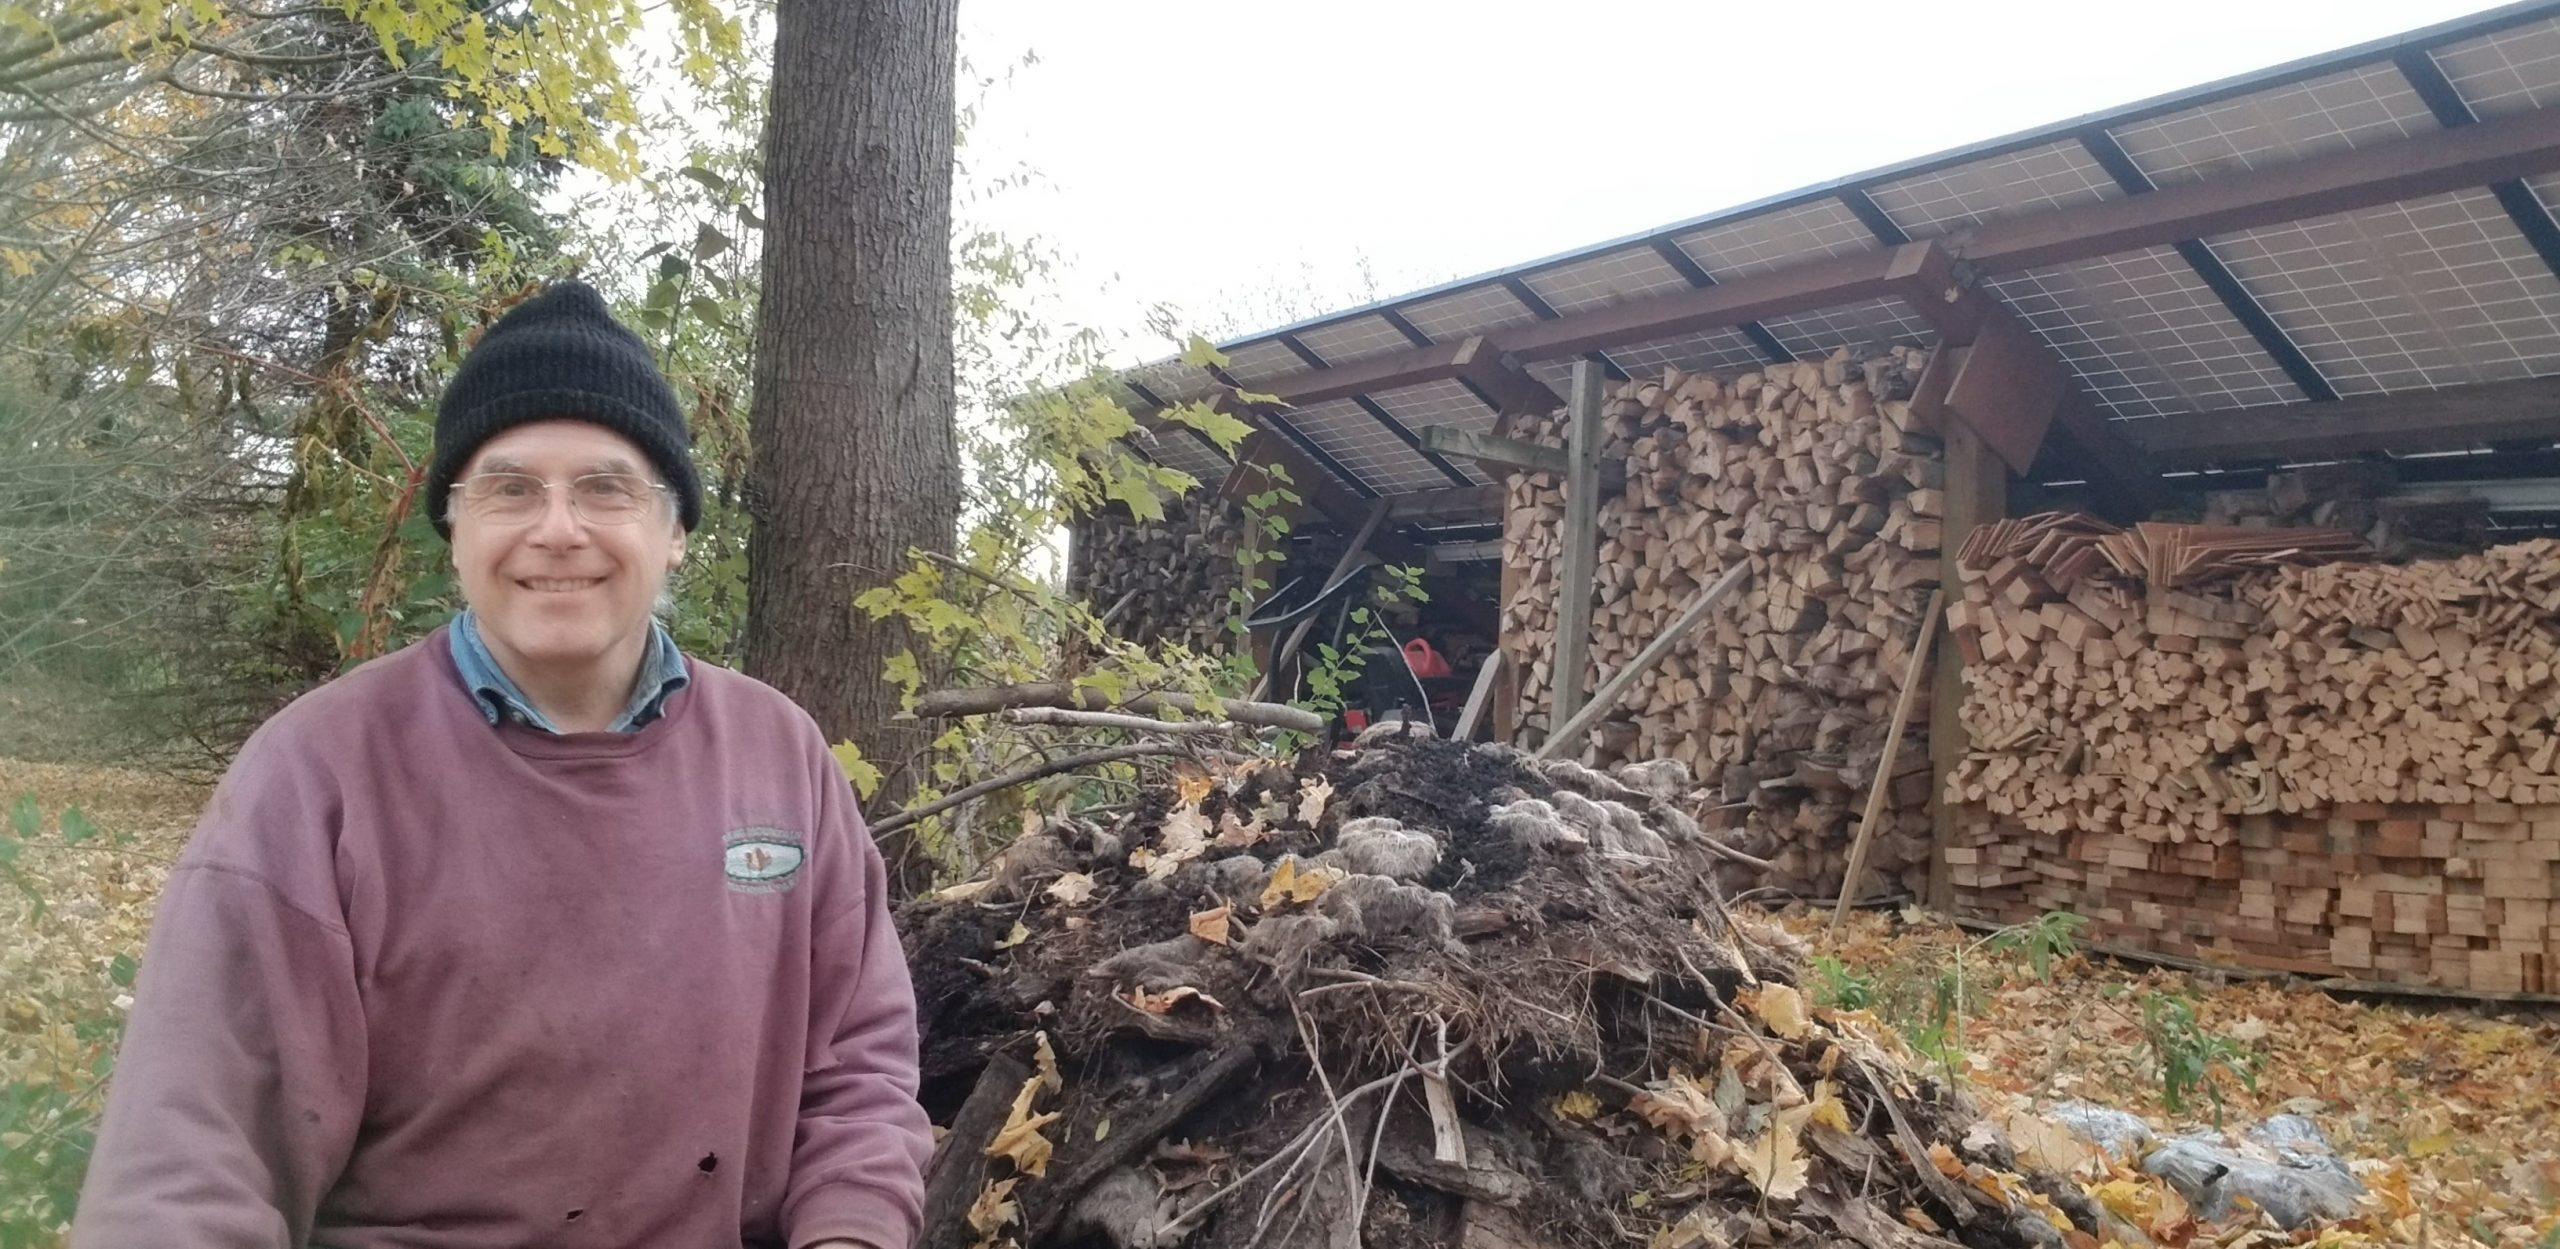 Steve Shantz with his compost pile